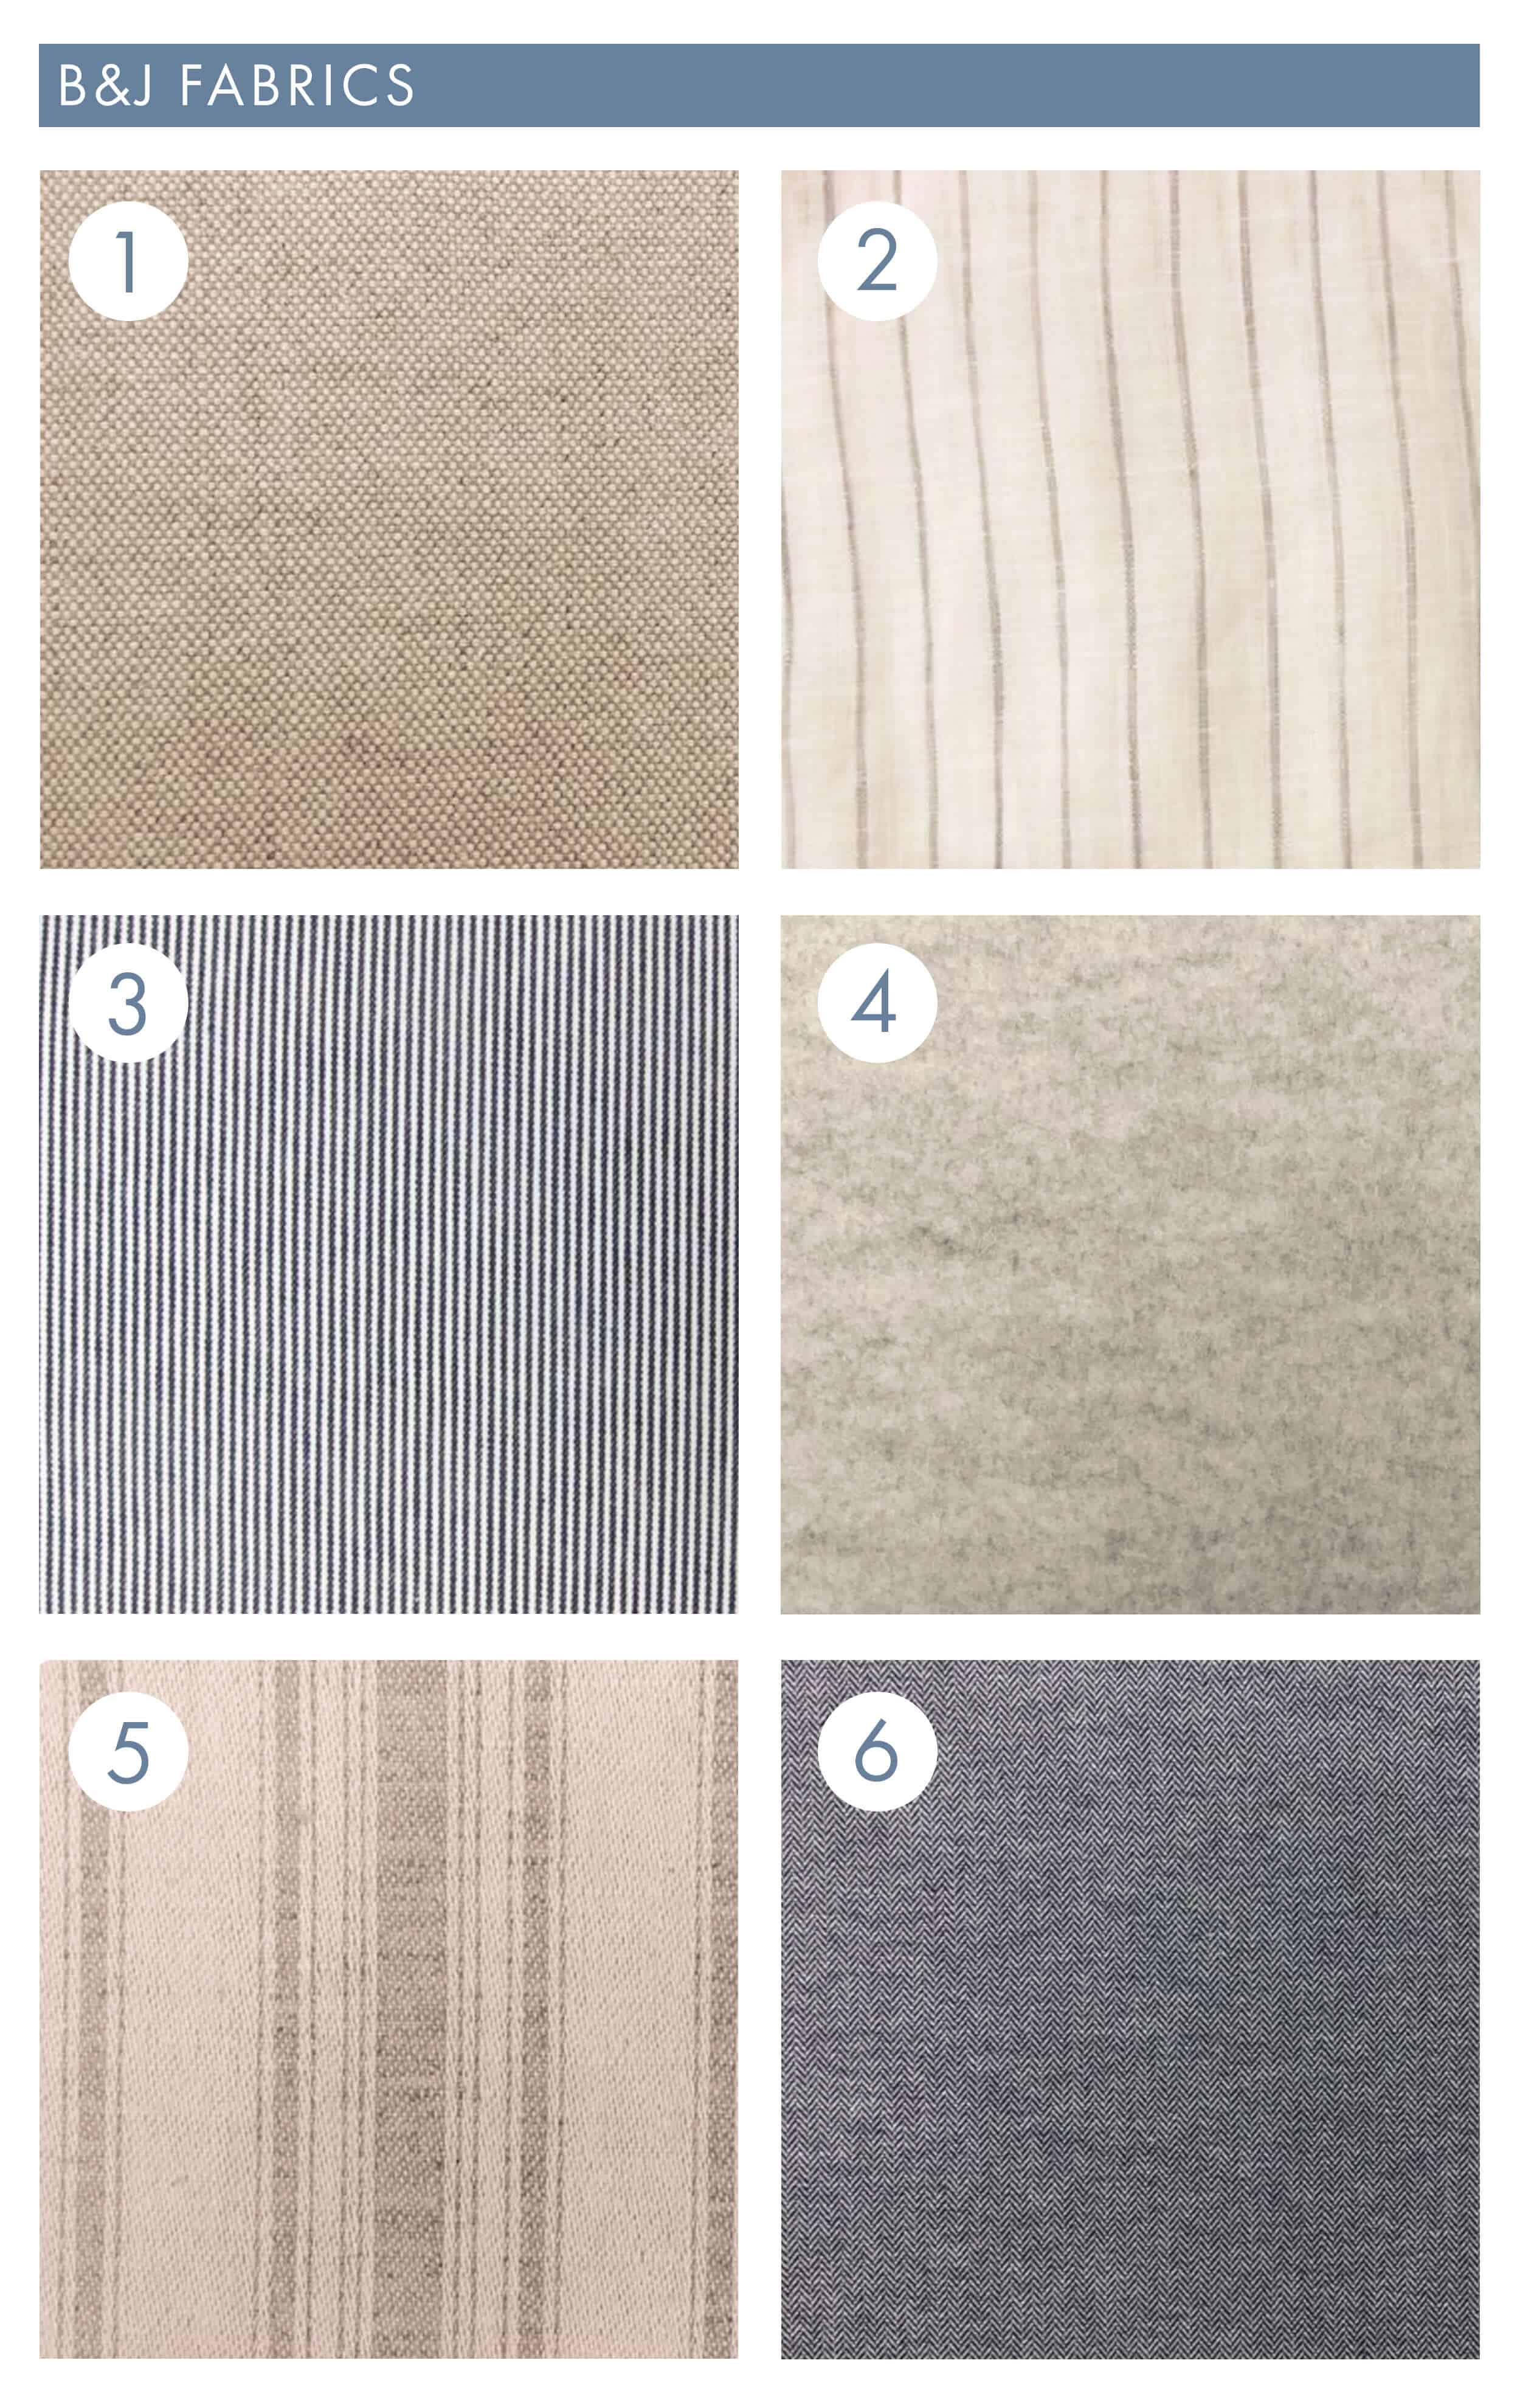 Bj Fabrics 20171